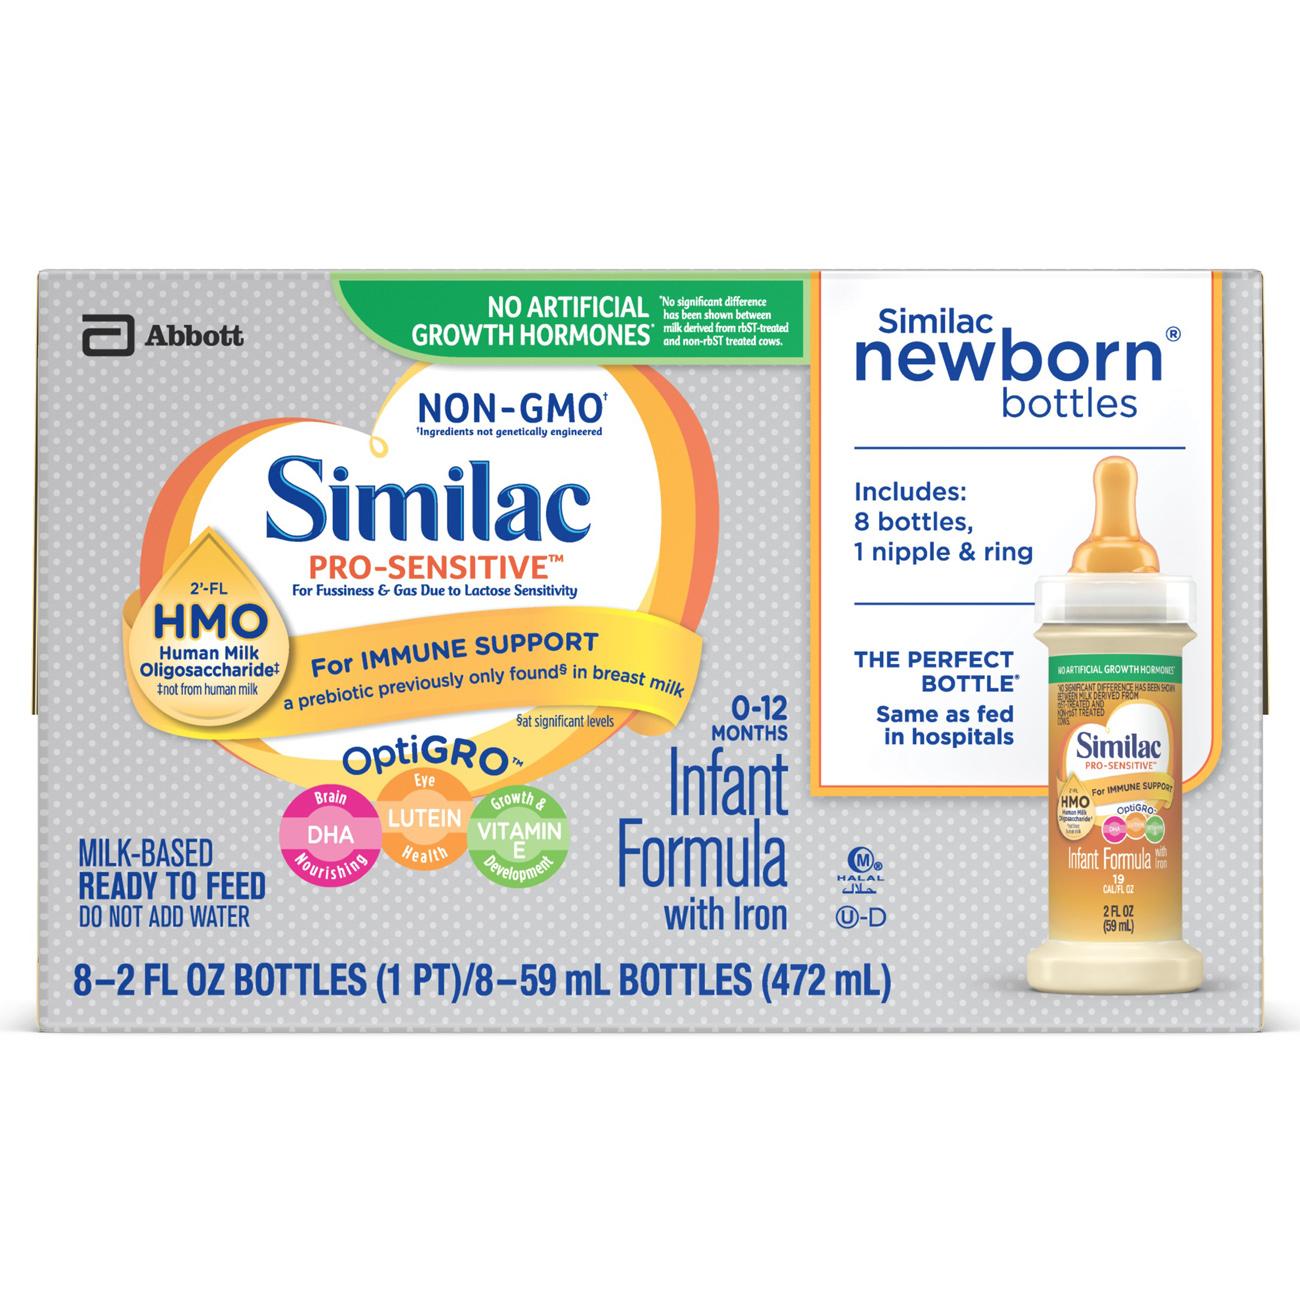 Similac Pro-Sensitive Non-GMO with 2'-FL HMO Infant Formula 2 oz Bottles (Pack of 8)